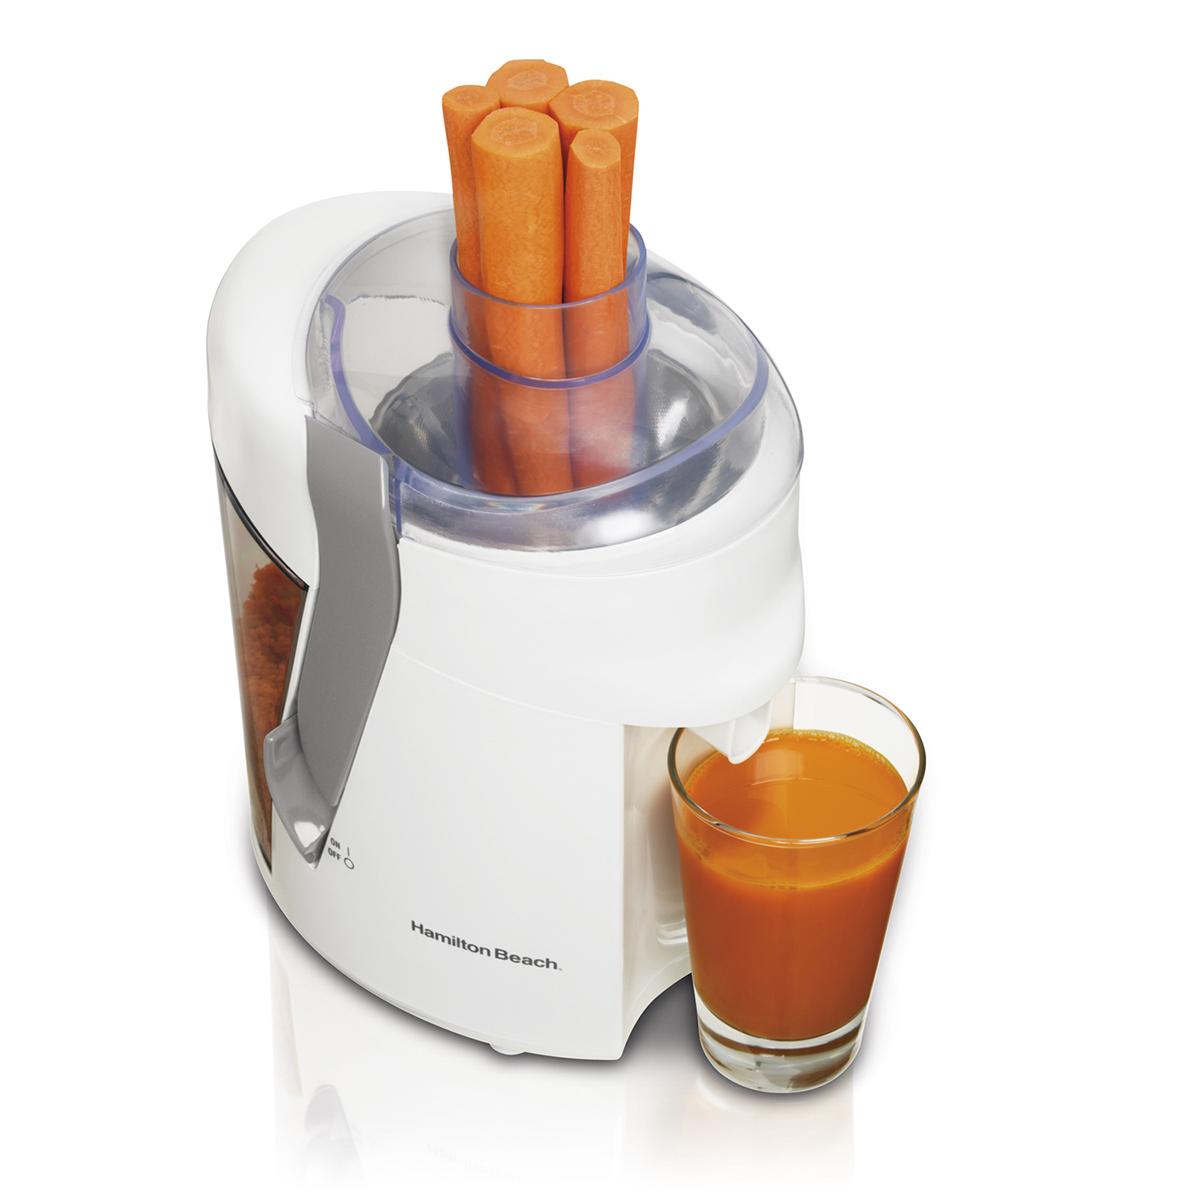 Hamilton Beach Dishwasher Safe Juicer Kitchen Juice Health